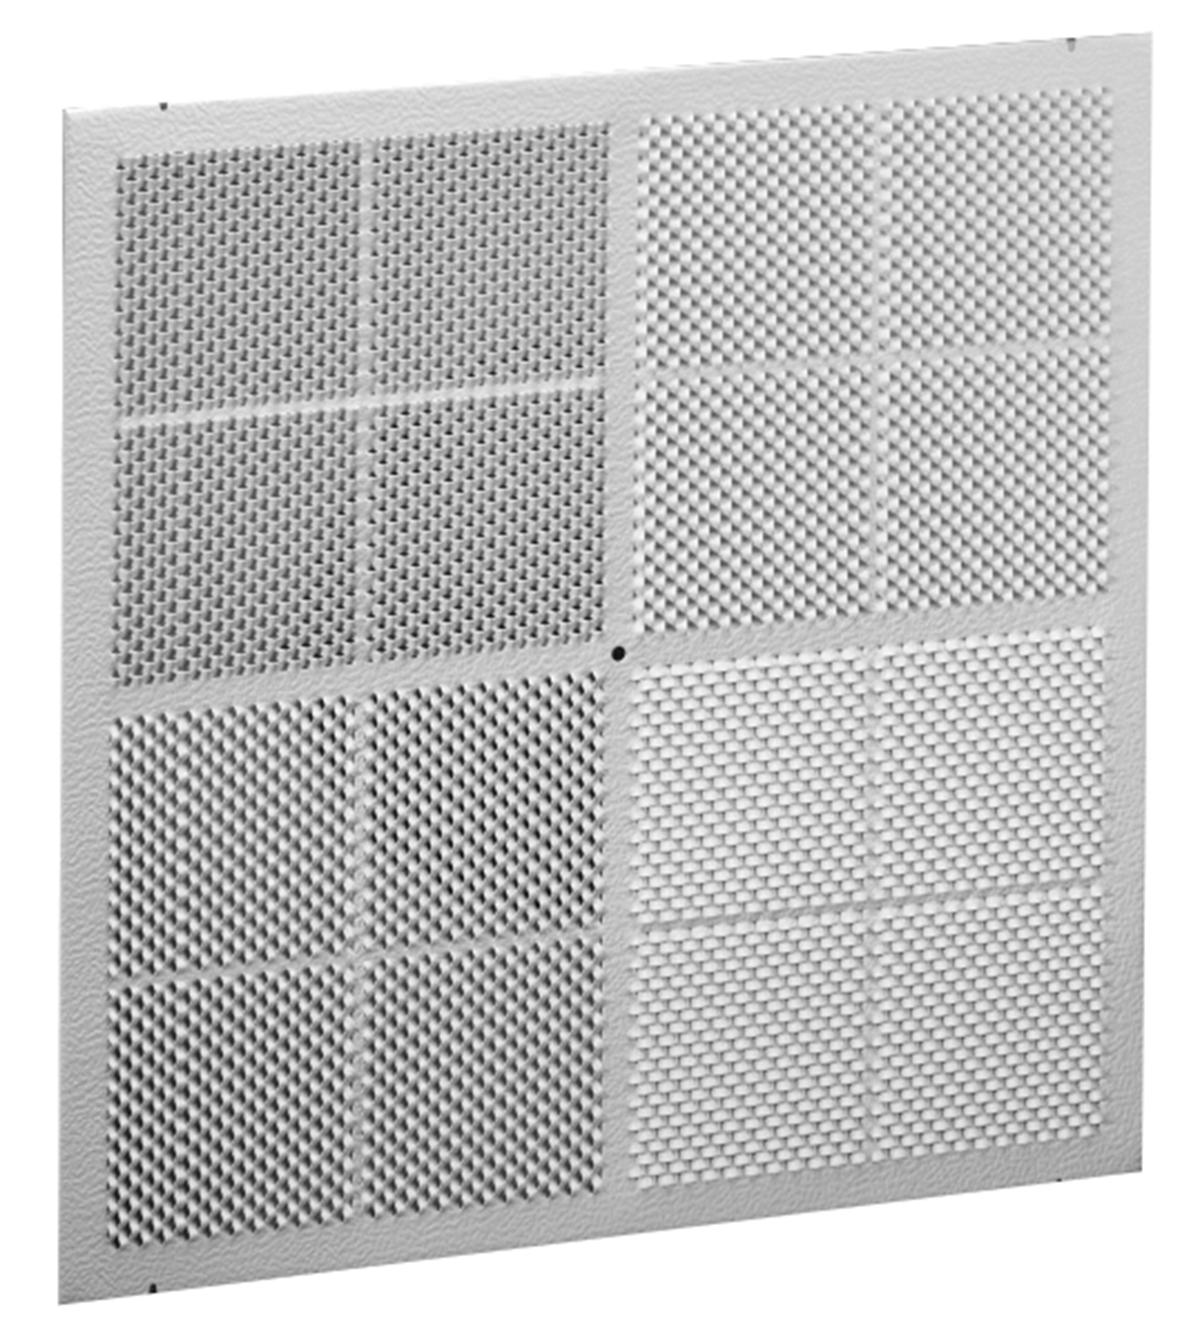 Ren4 Aluminum Renovator Series Diffuser 4 Way Molded